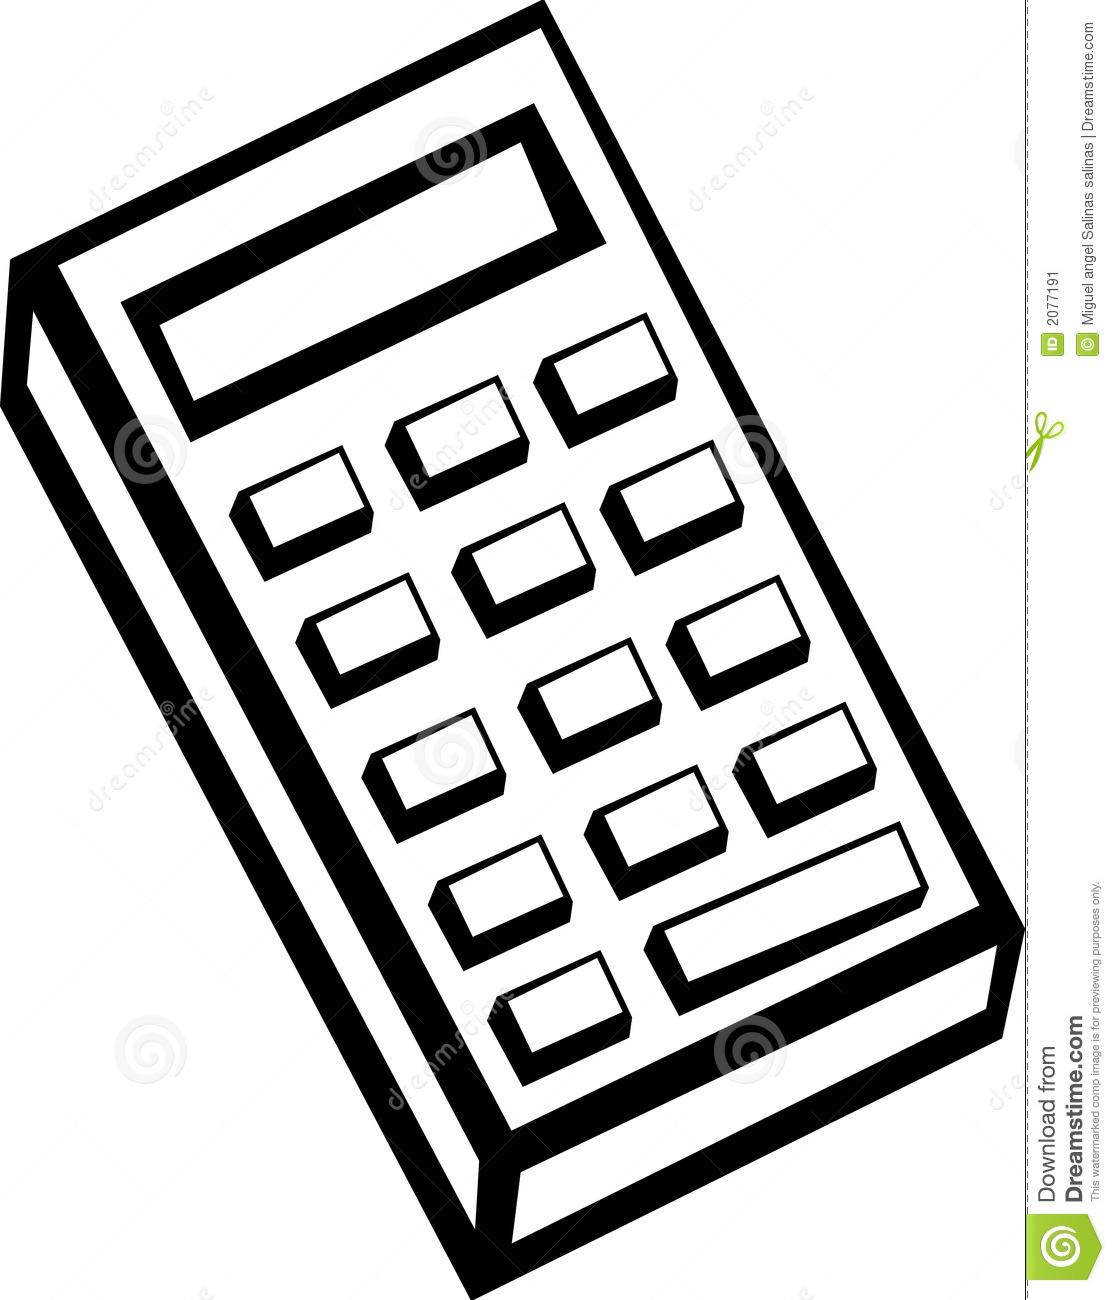 1115x1300 Calculator Clipart 23119 Clip Art Graphic Of A Calculator Cartoon